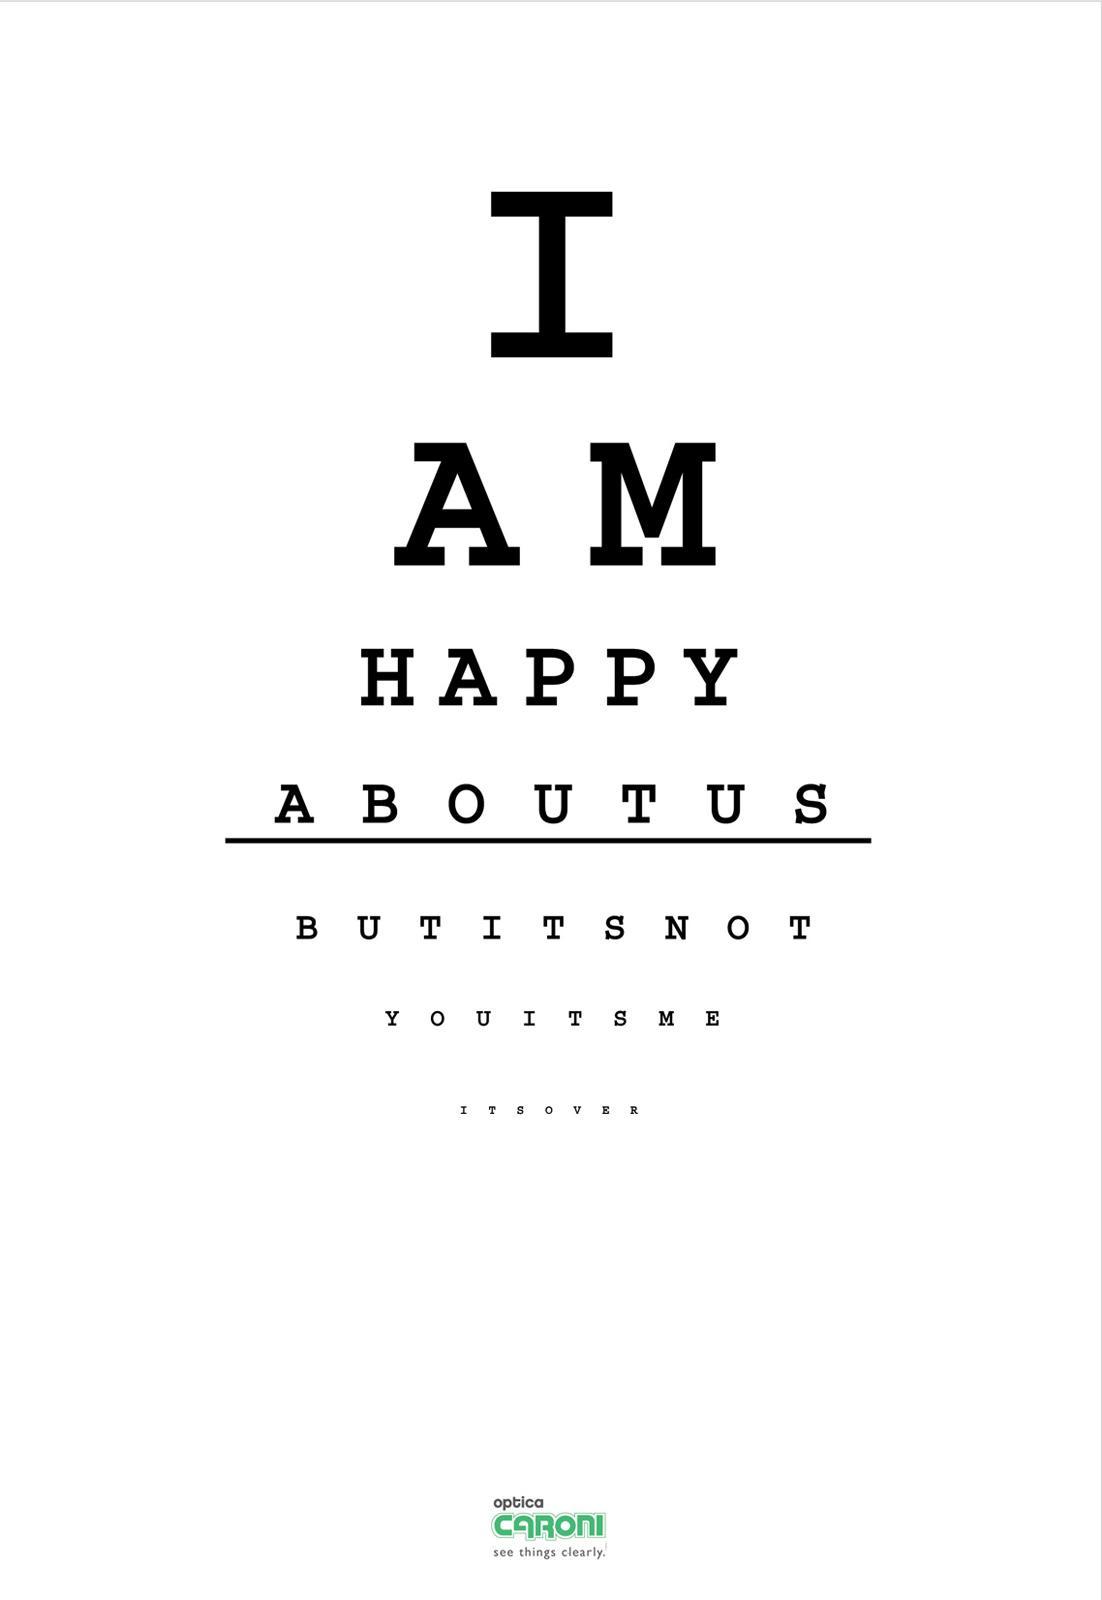 Optica Caroni Print Ad -  Happy